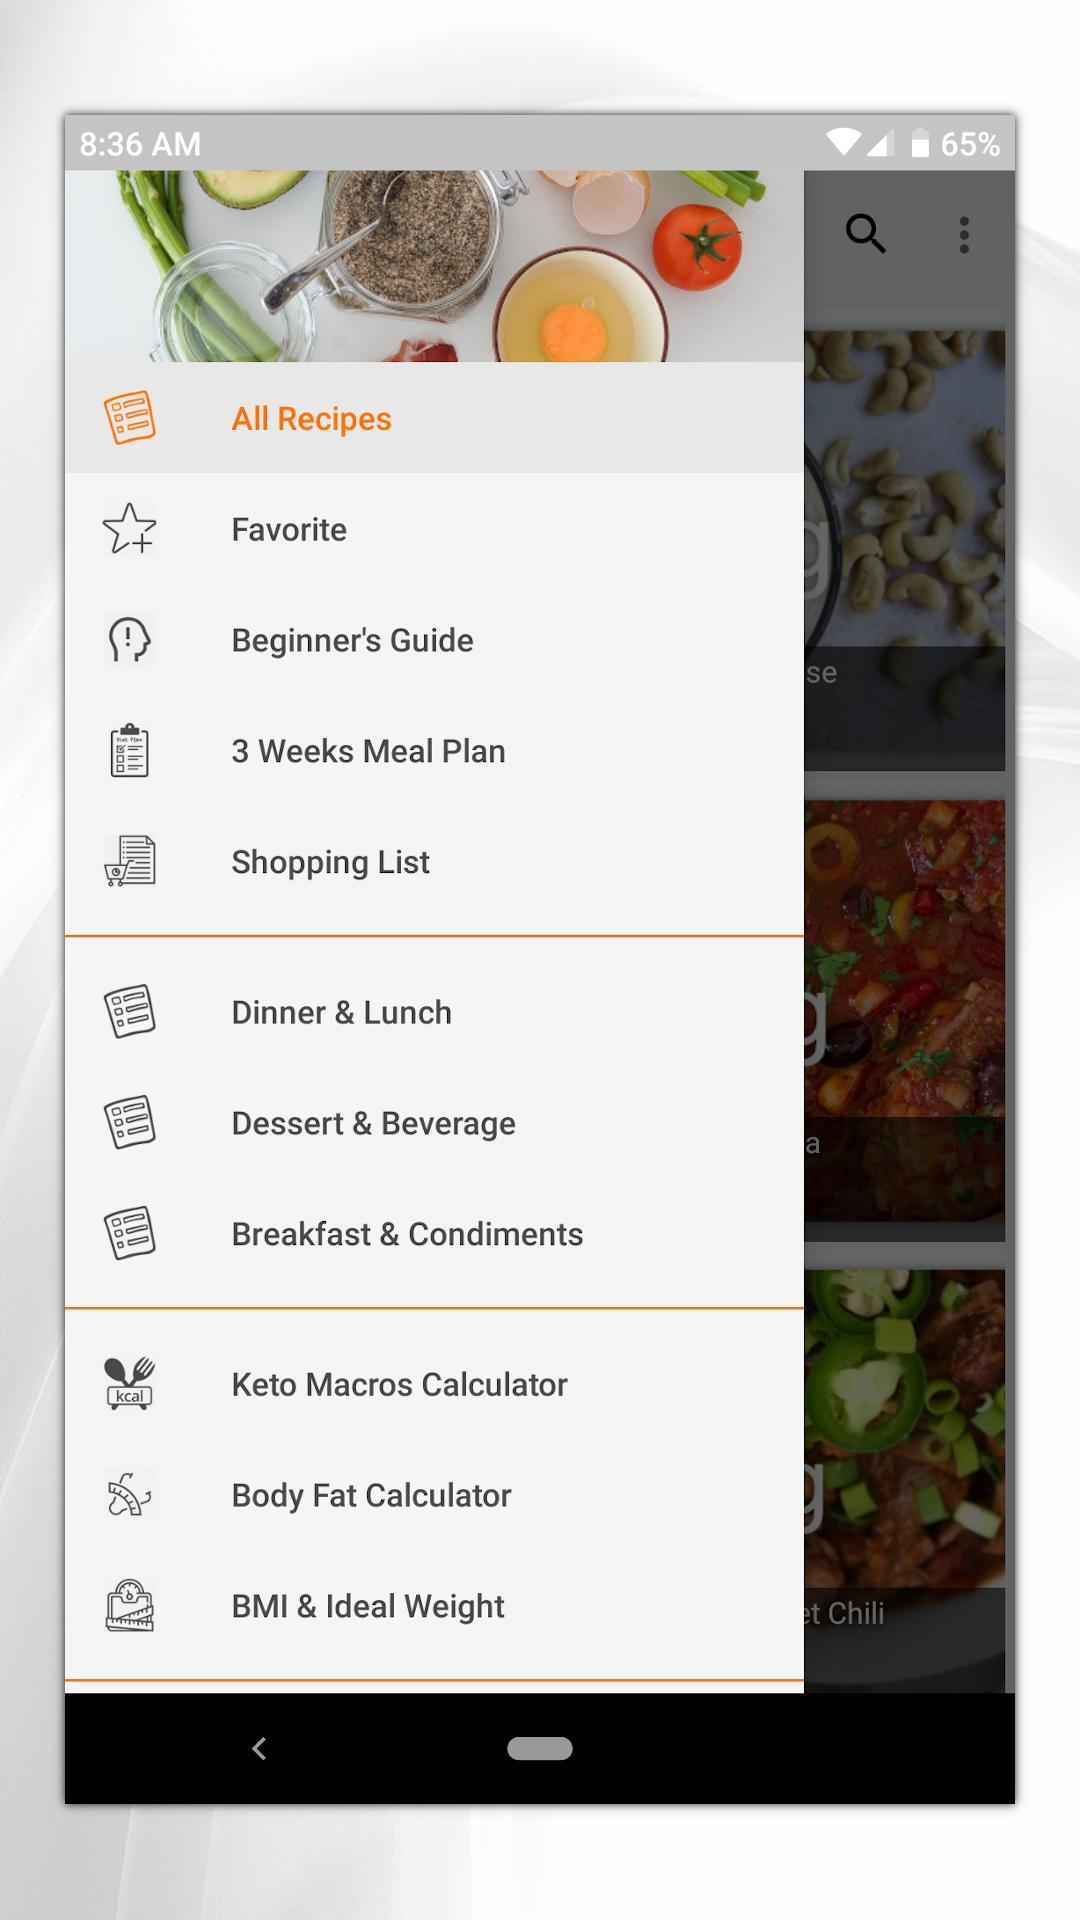 Keto Diet Recipes Pro Keto Macros Calculator For Android Apk Download